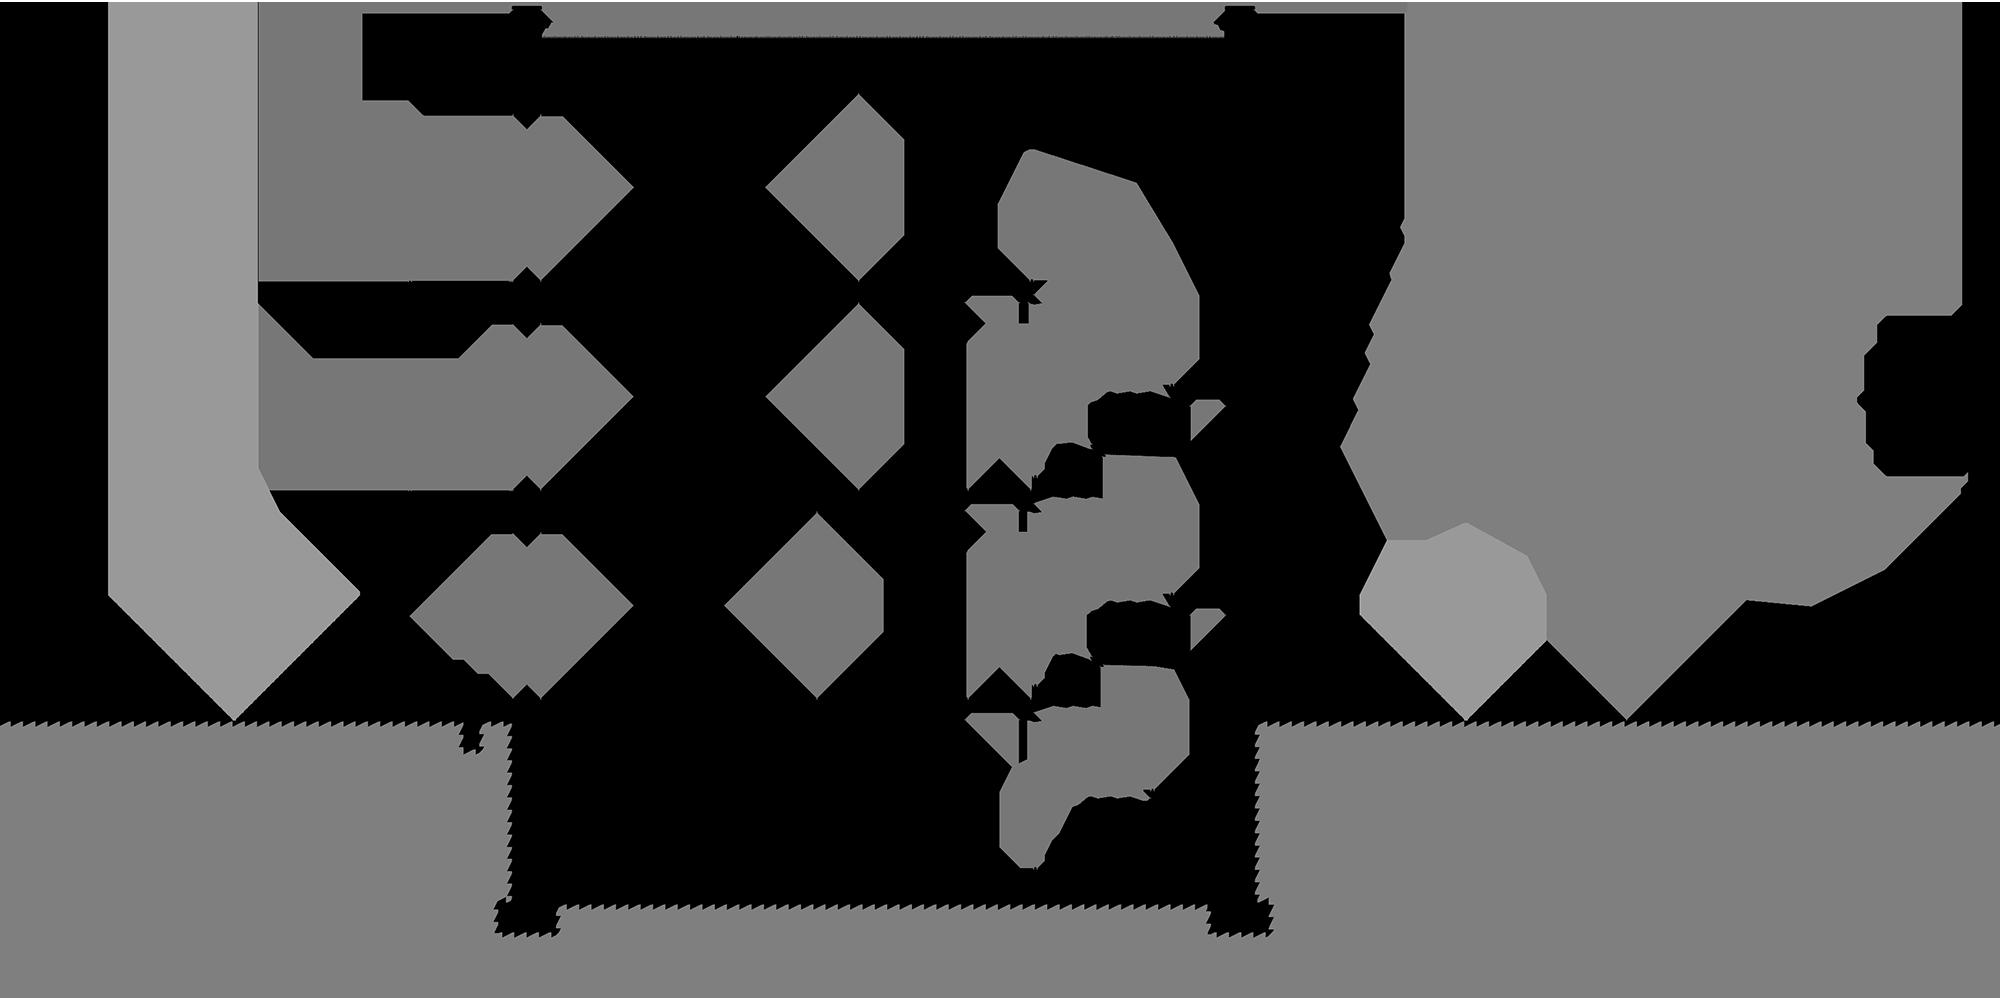 KRK-NIE-twin-04-section